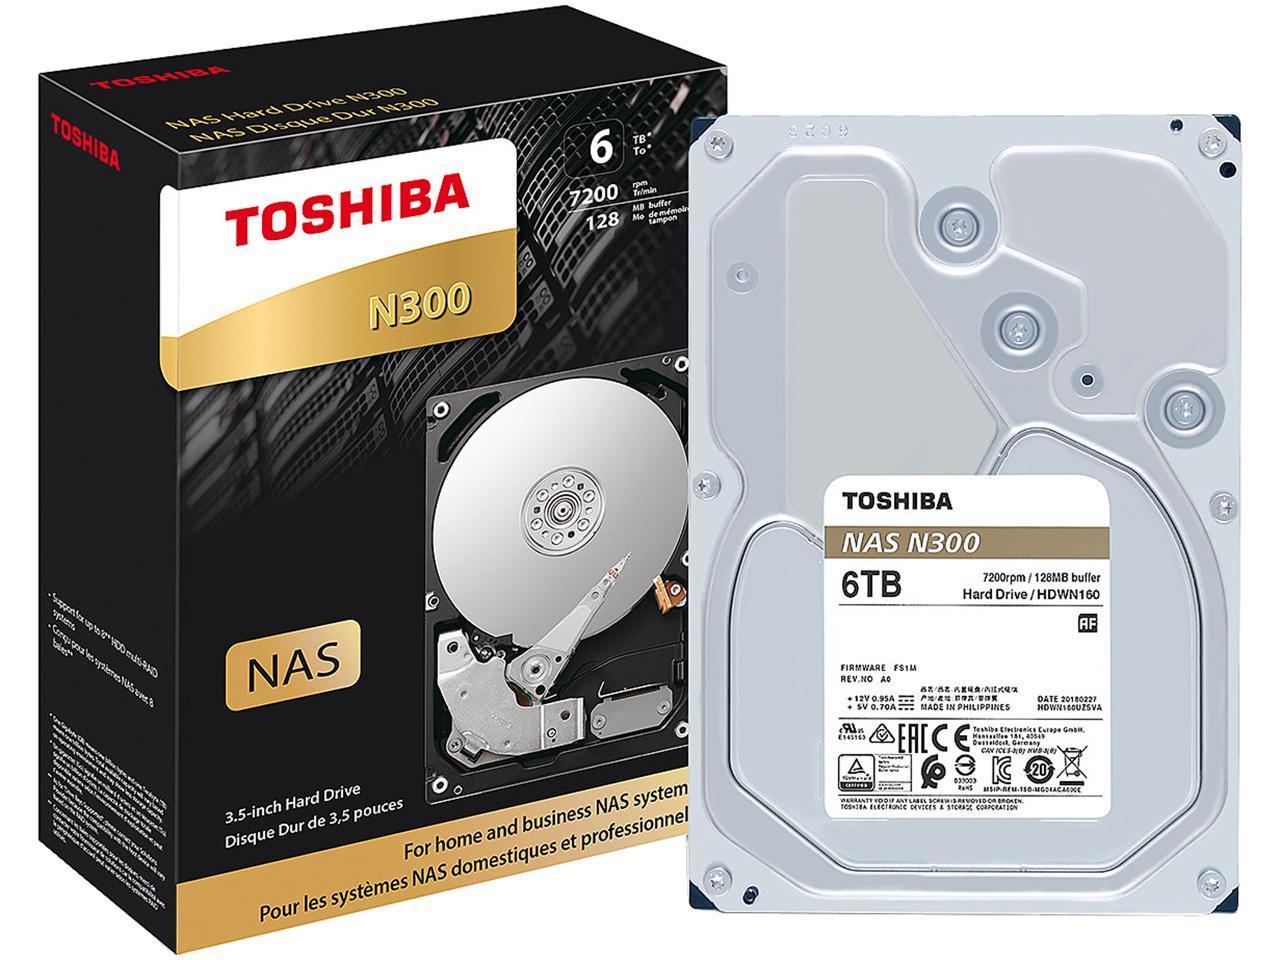 "Toshiba N300 3.5"" 6TB Internal Hard Drive"